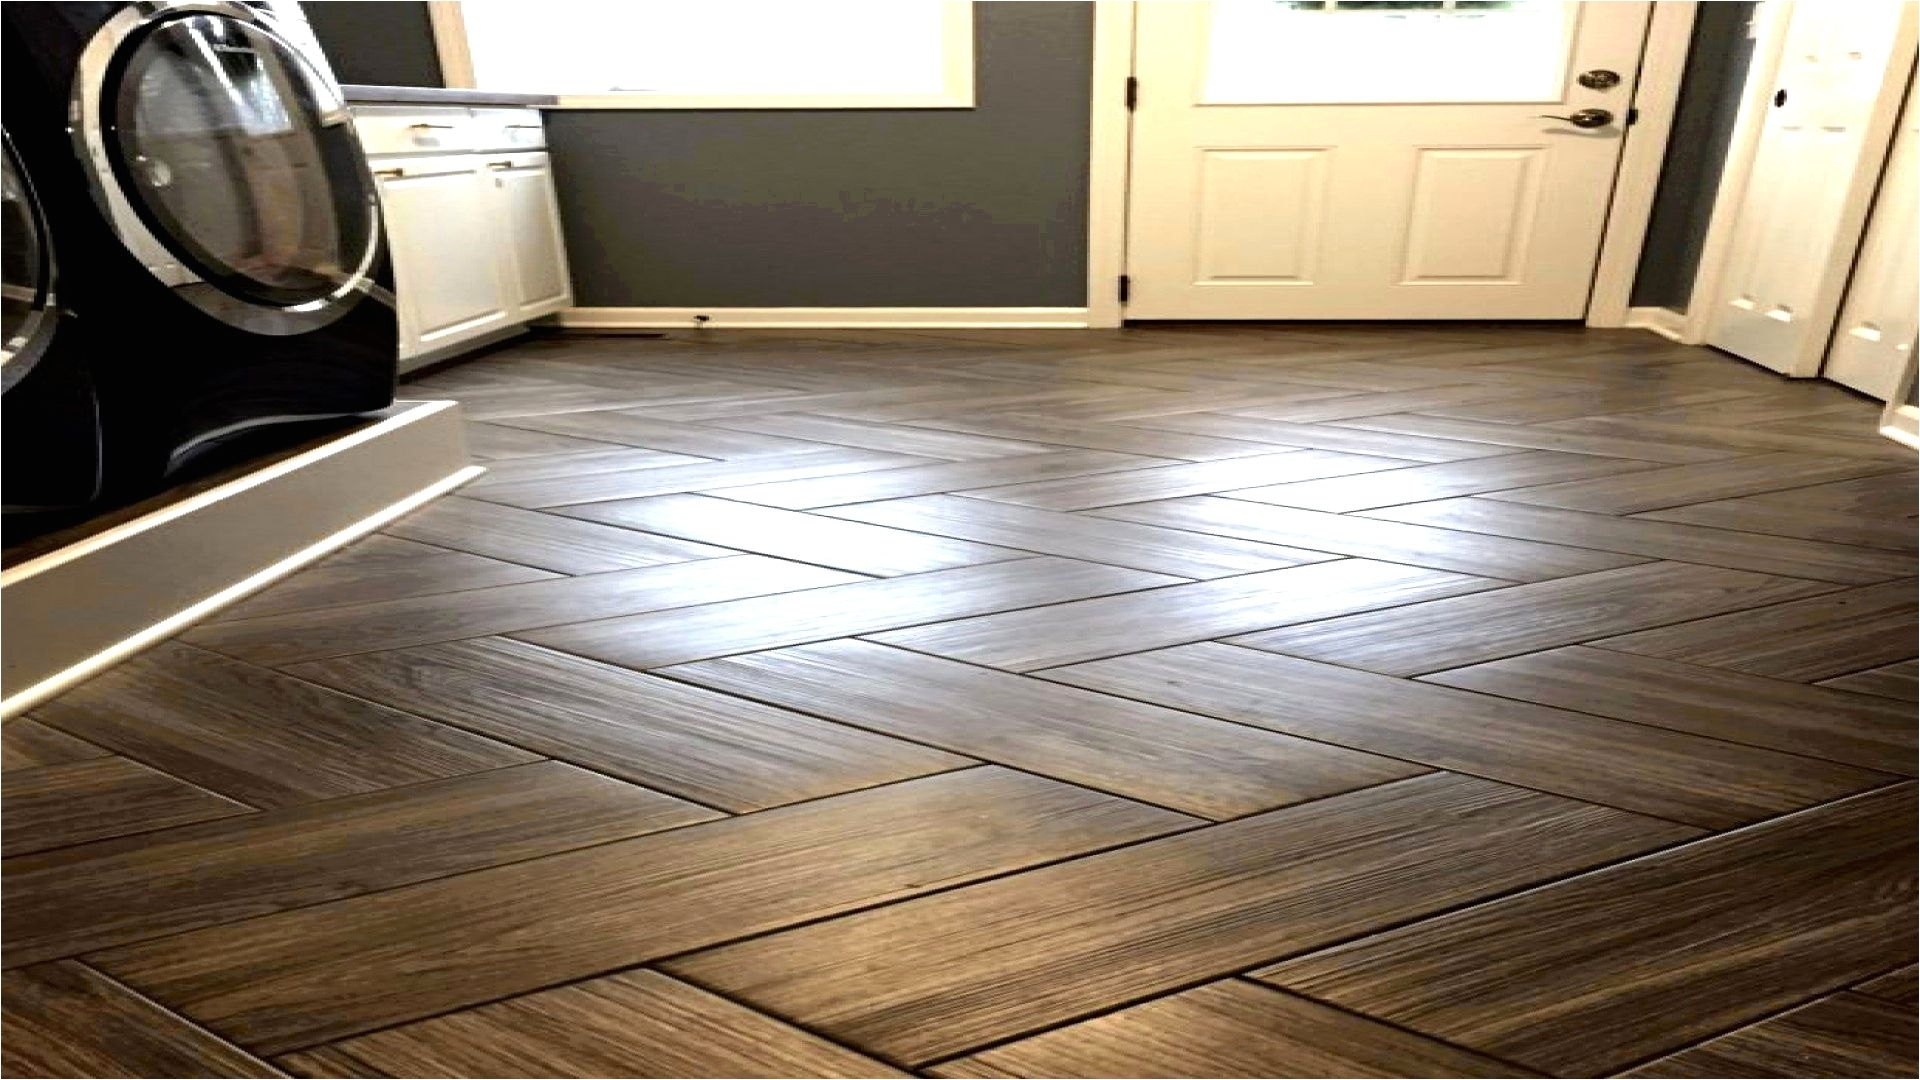 Vinyl Plank Flooring Installation Bathroom 40 How to Remove Vinyl Floor Tile Inspiration